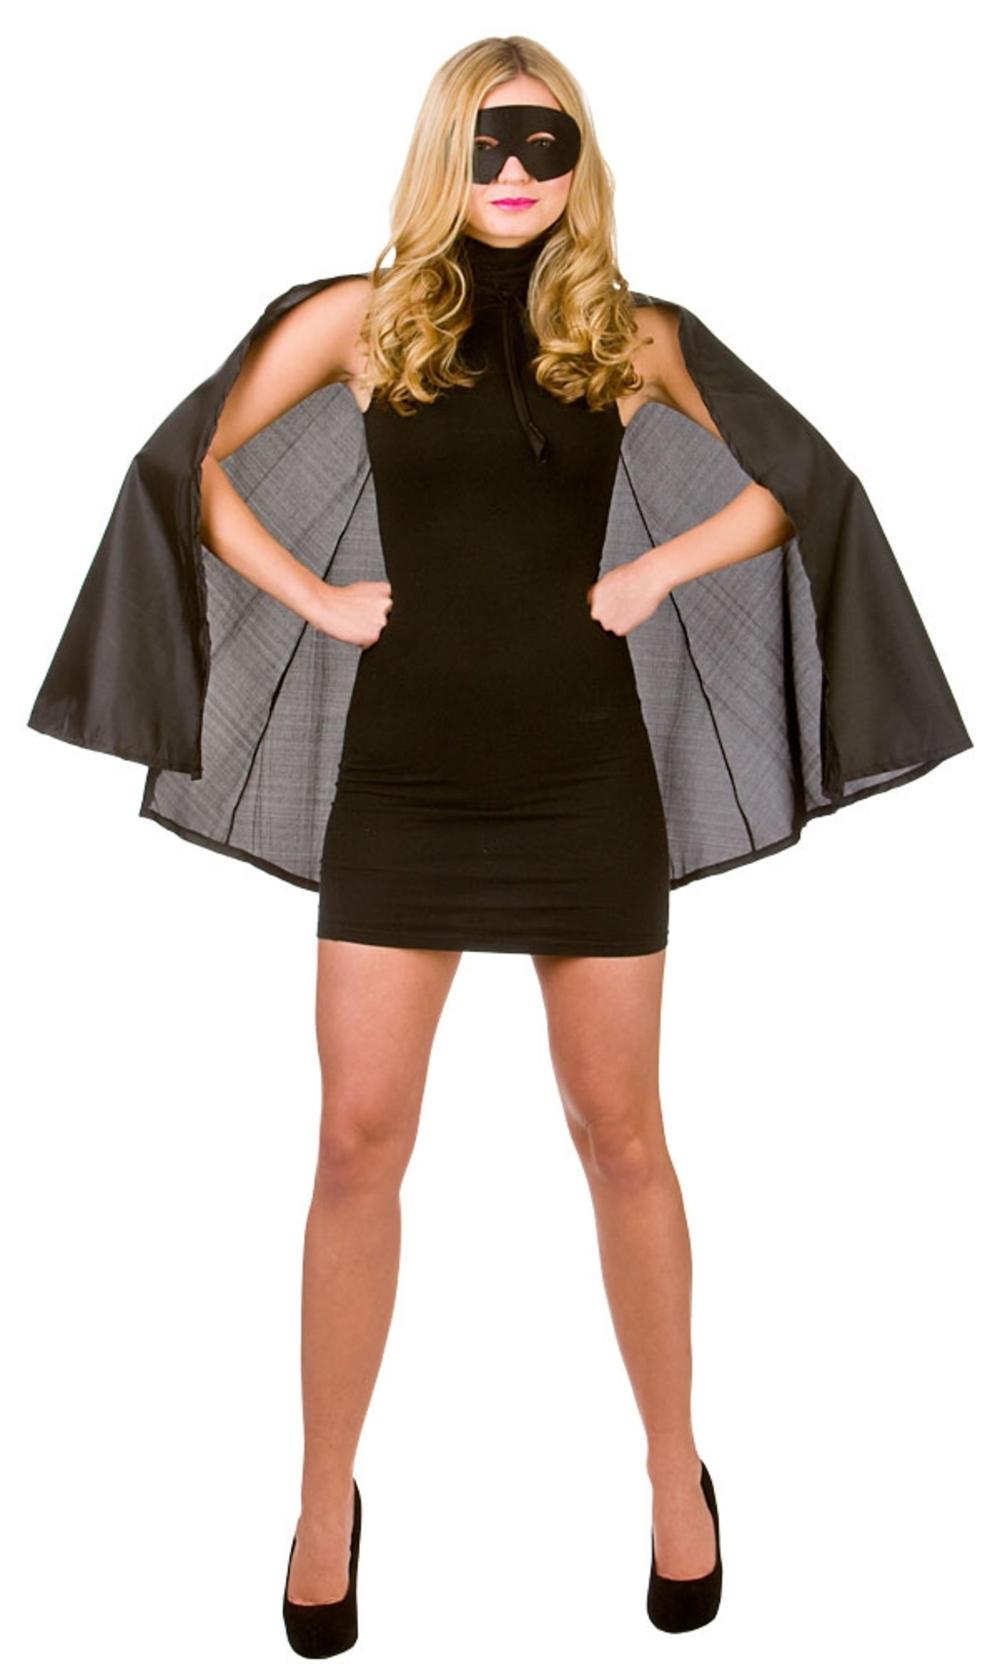 Adults Black Superhero Cape & Mask Costume Accessory